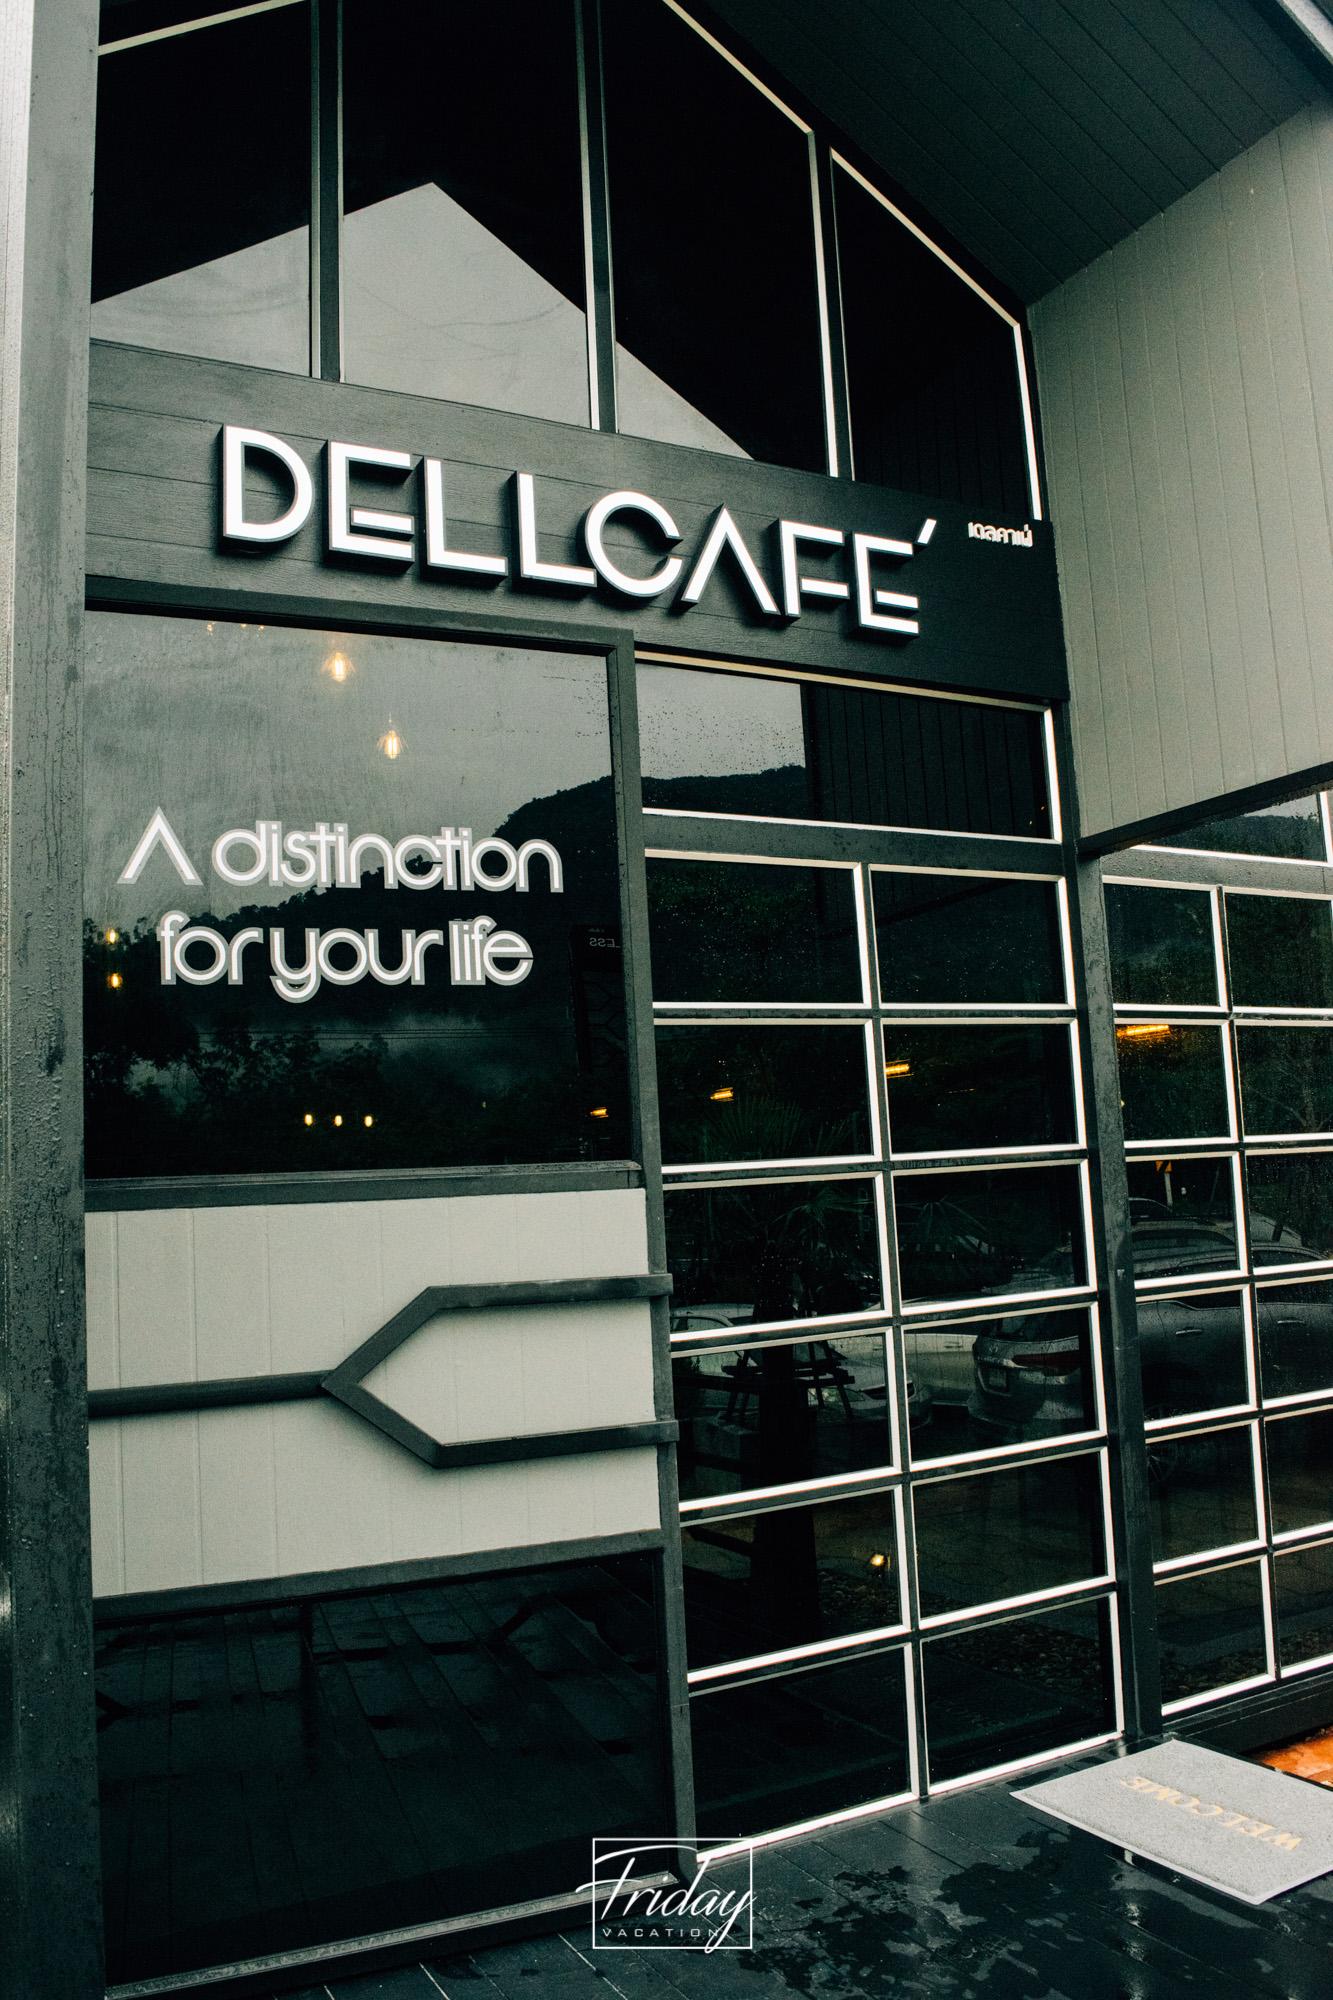 D ENDLESS ร้านกาแฟนครศรีเปิดใหม่ วิวสวย นครศรีดีย์